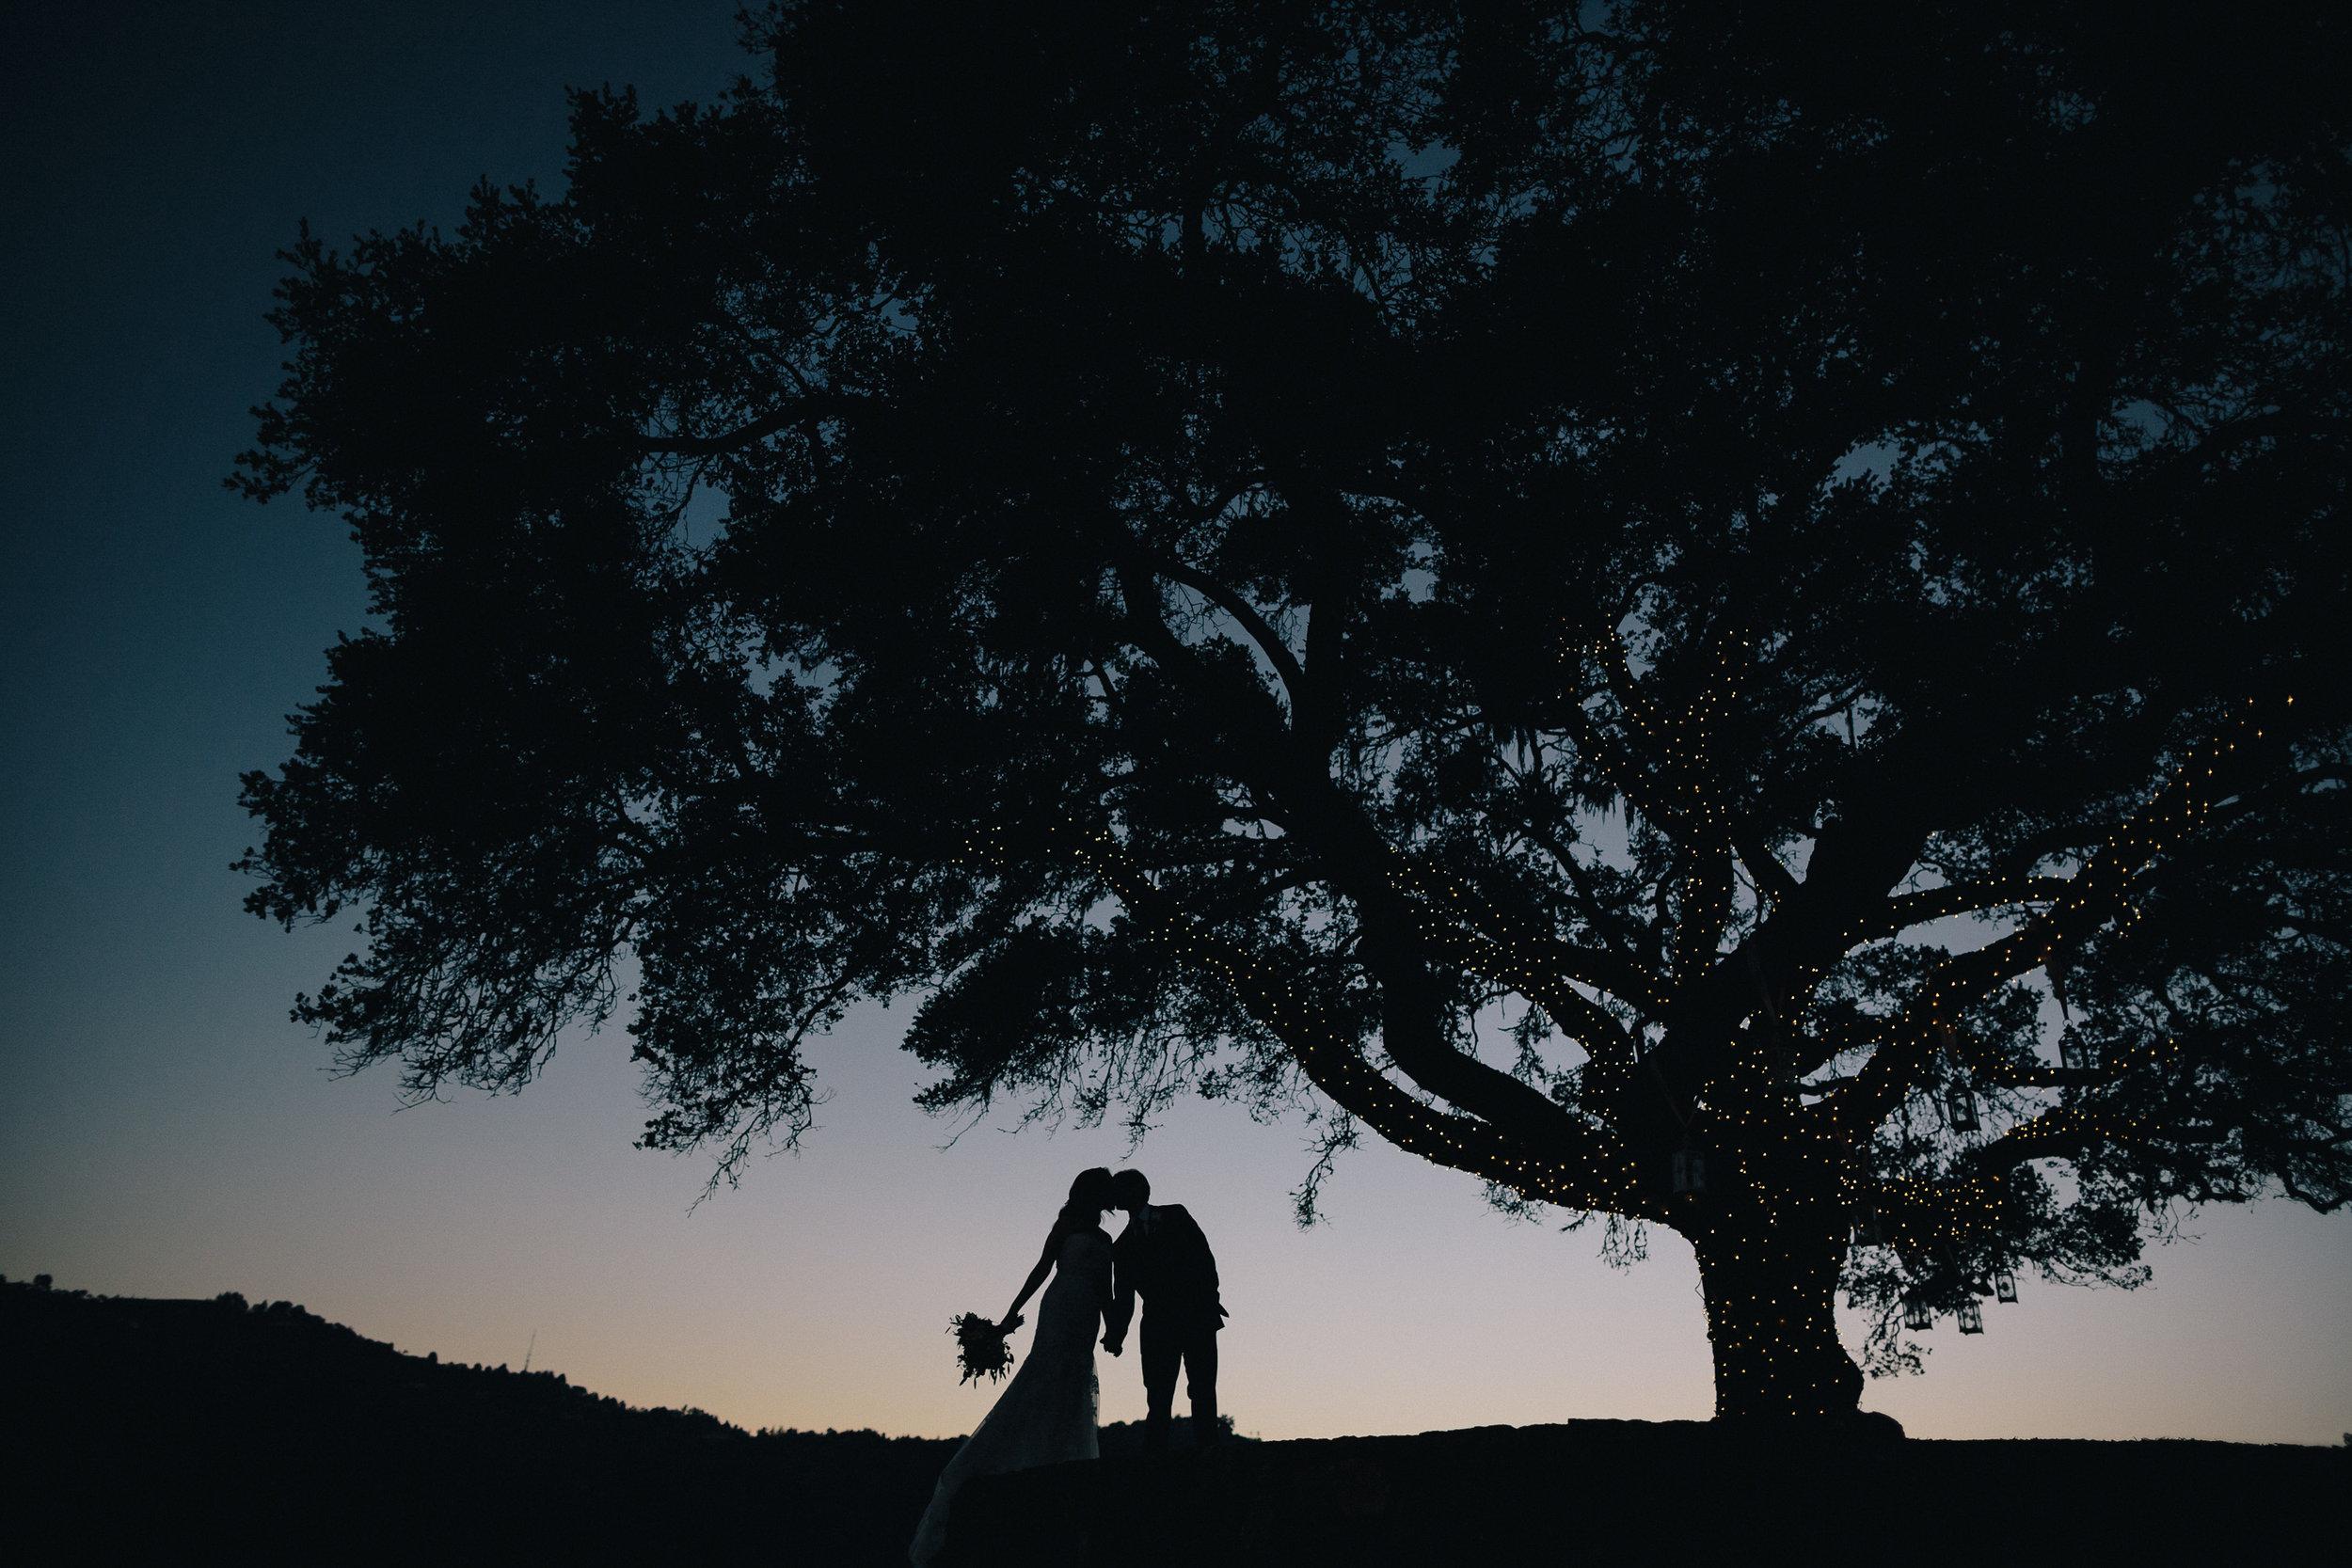 Helen & Matt Wedding   Nicklaus Club - Monterey, CA